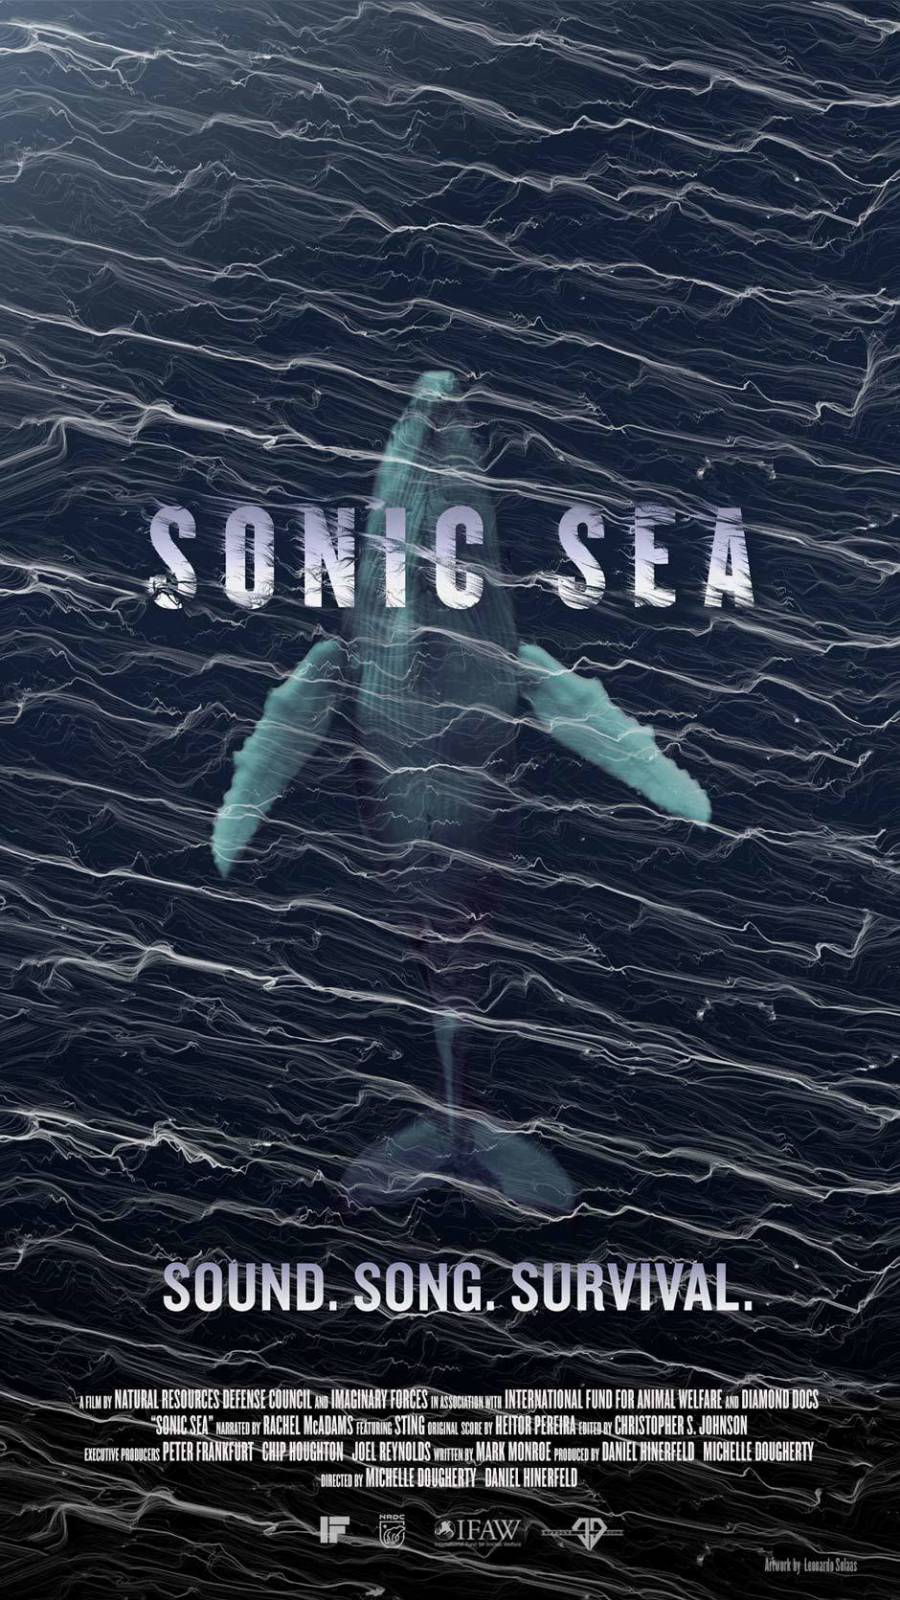 Sonic sea movie documentary documentaire Emmys Awards IFAW